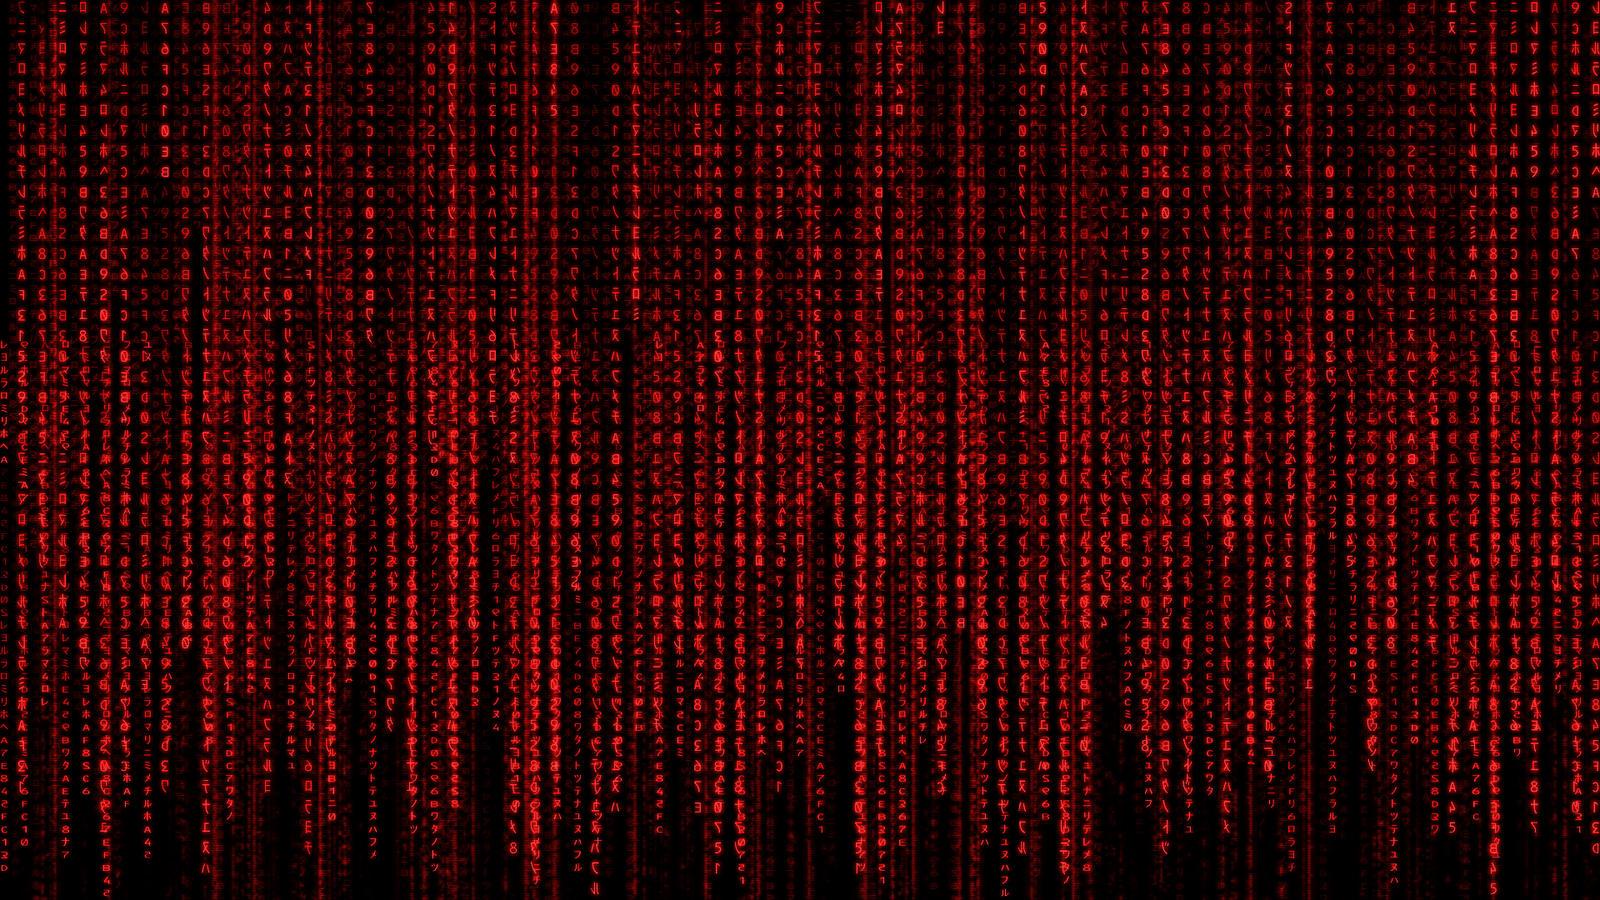 red matrix wallpaper moving - photo #1